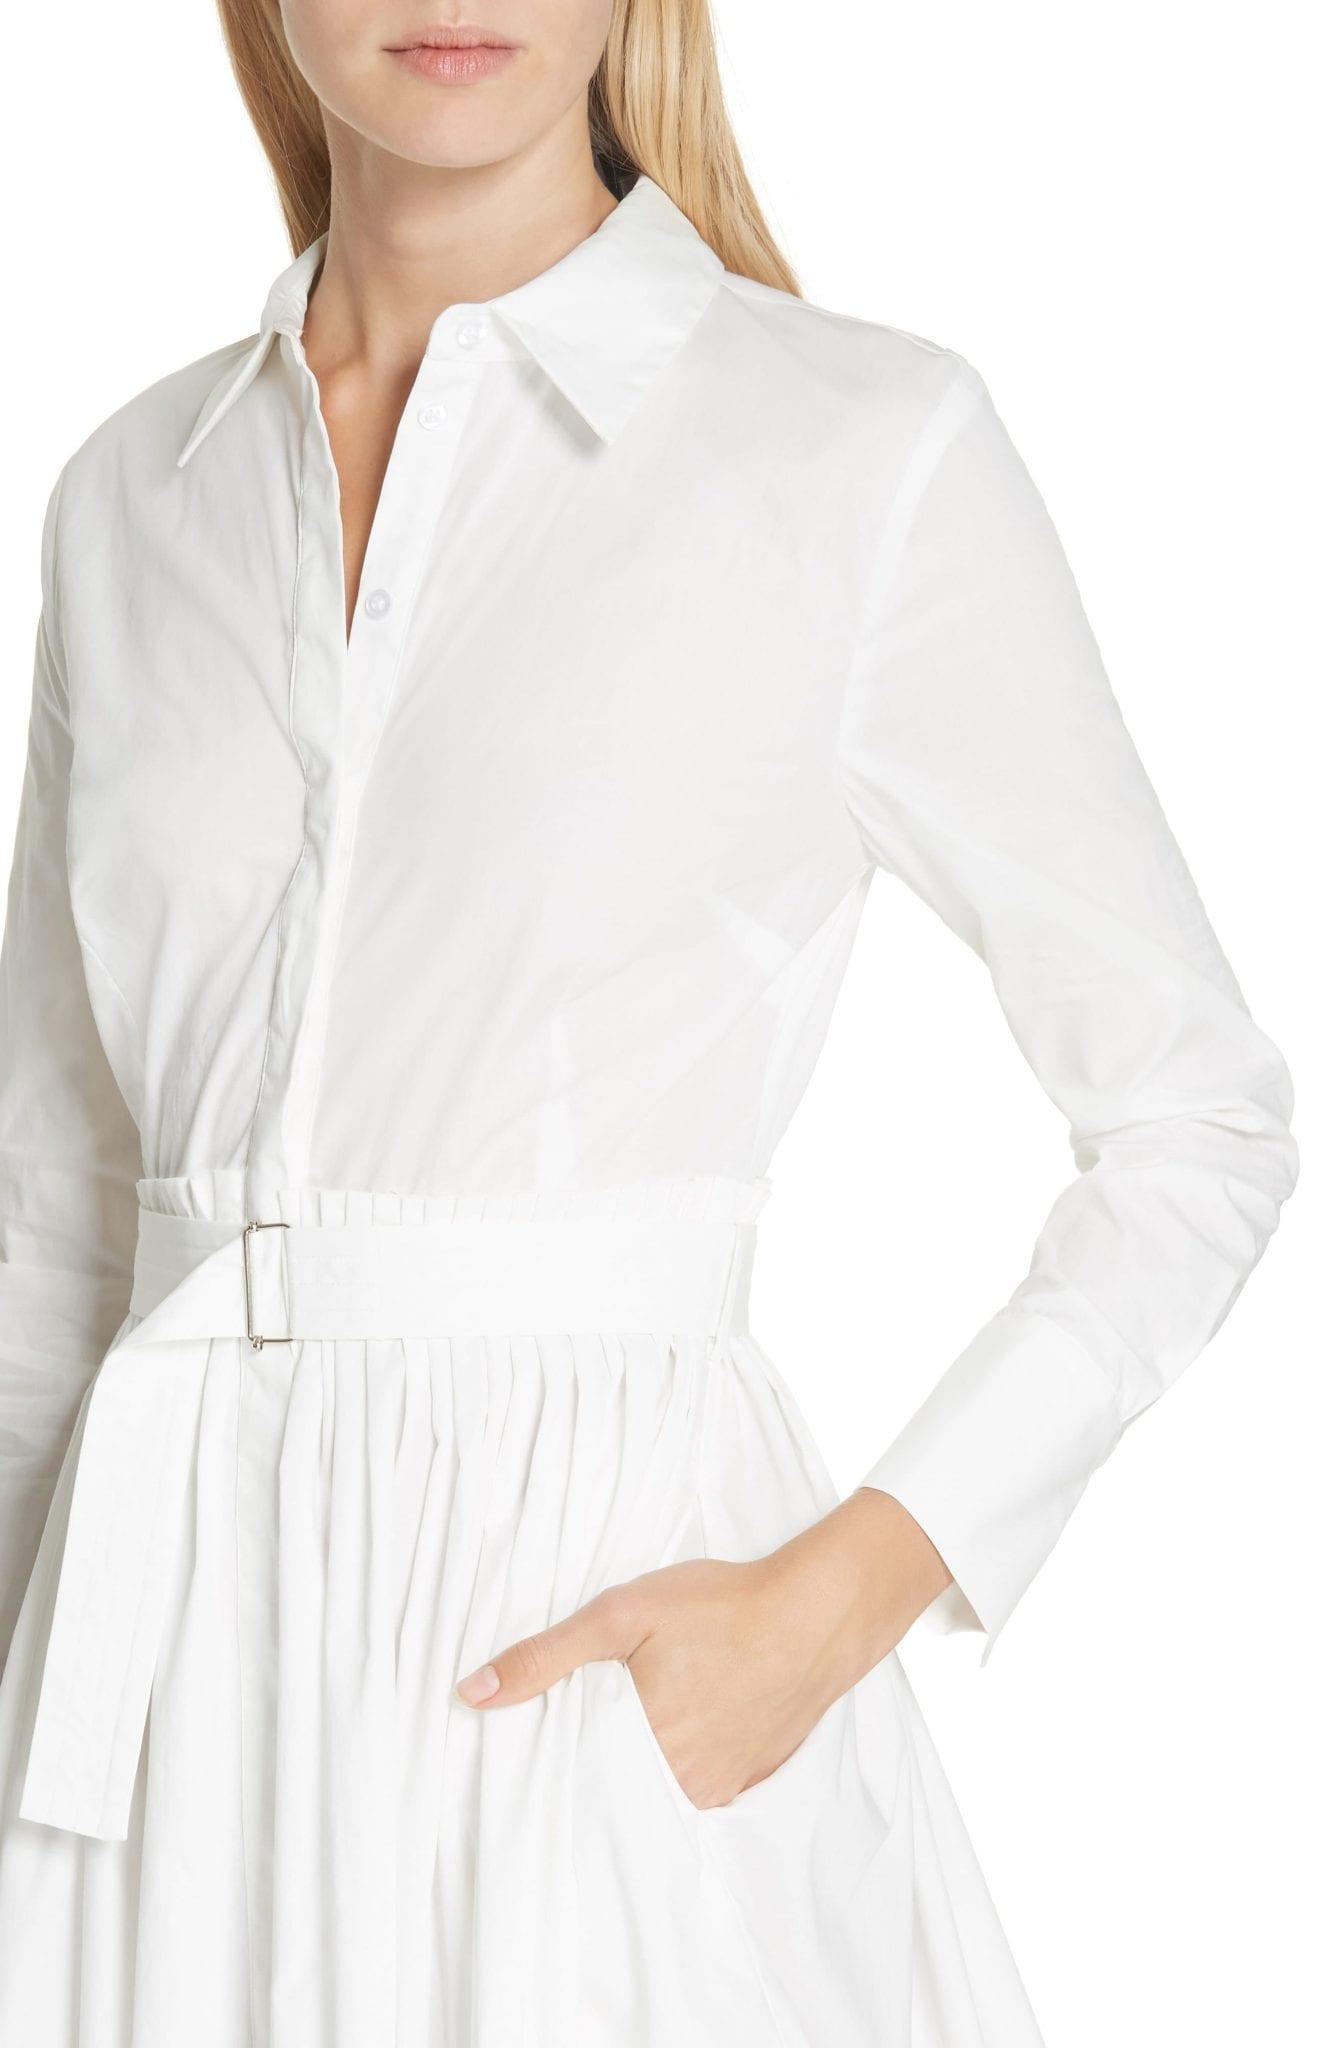 Knitted Open Shoulder Backless Flounce Plain Bell Sleeve Short Sleeve Casual Dresses vans winter